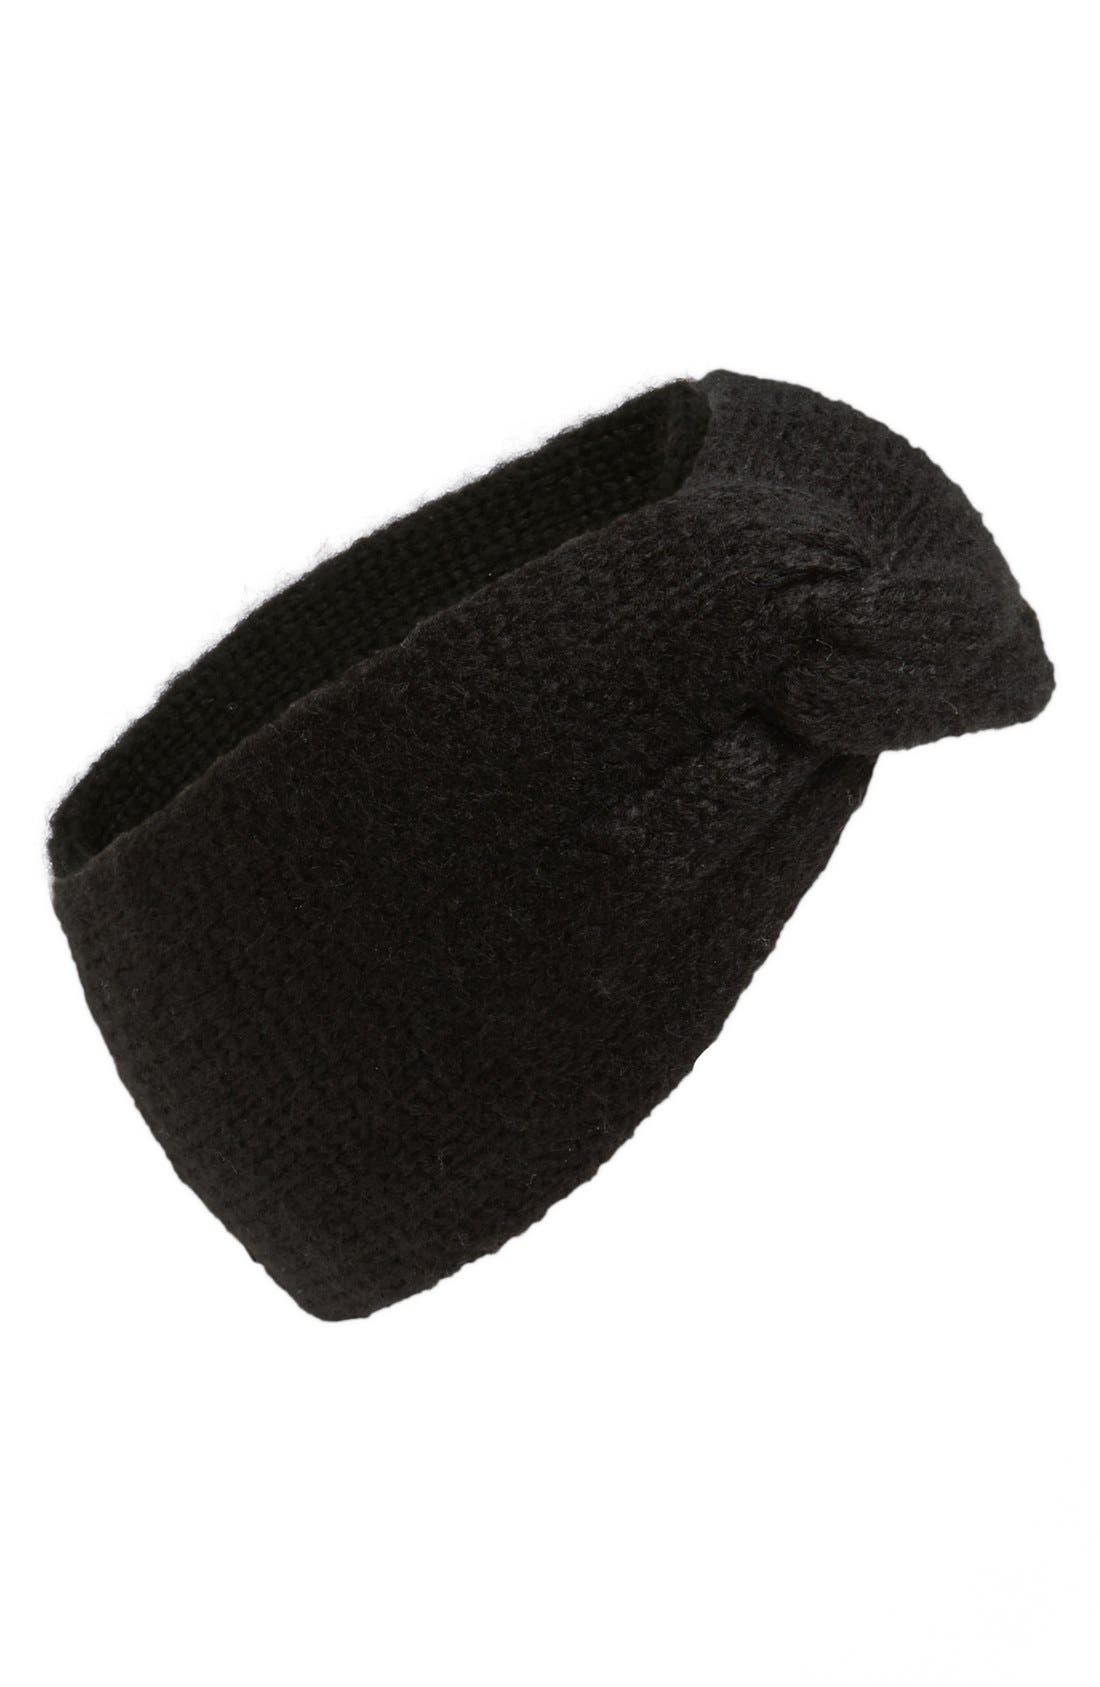 Alternate Image 1 Selected - BP. Knotted Sweater Headband (Juniors)